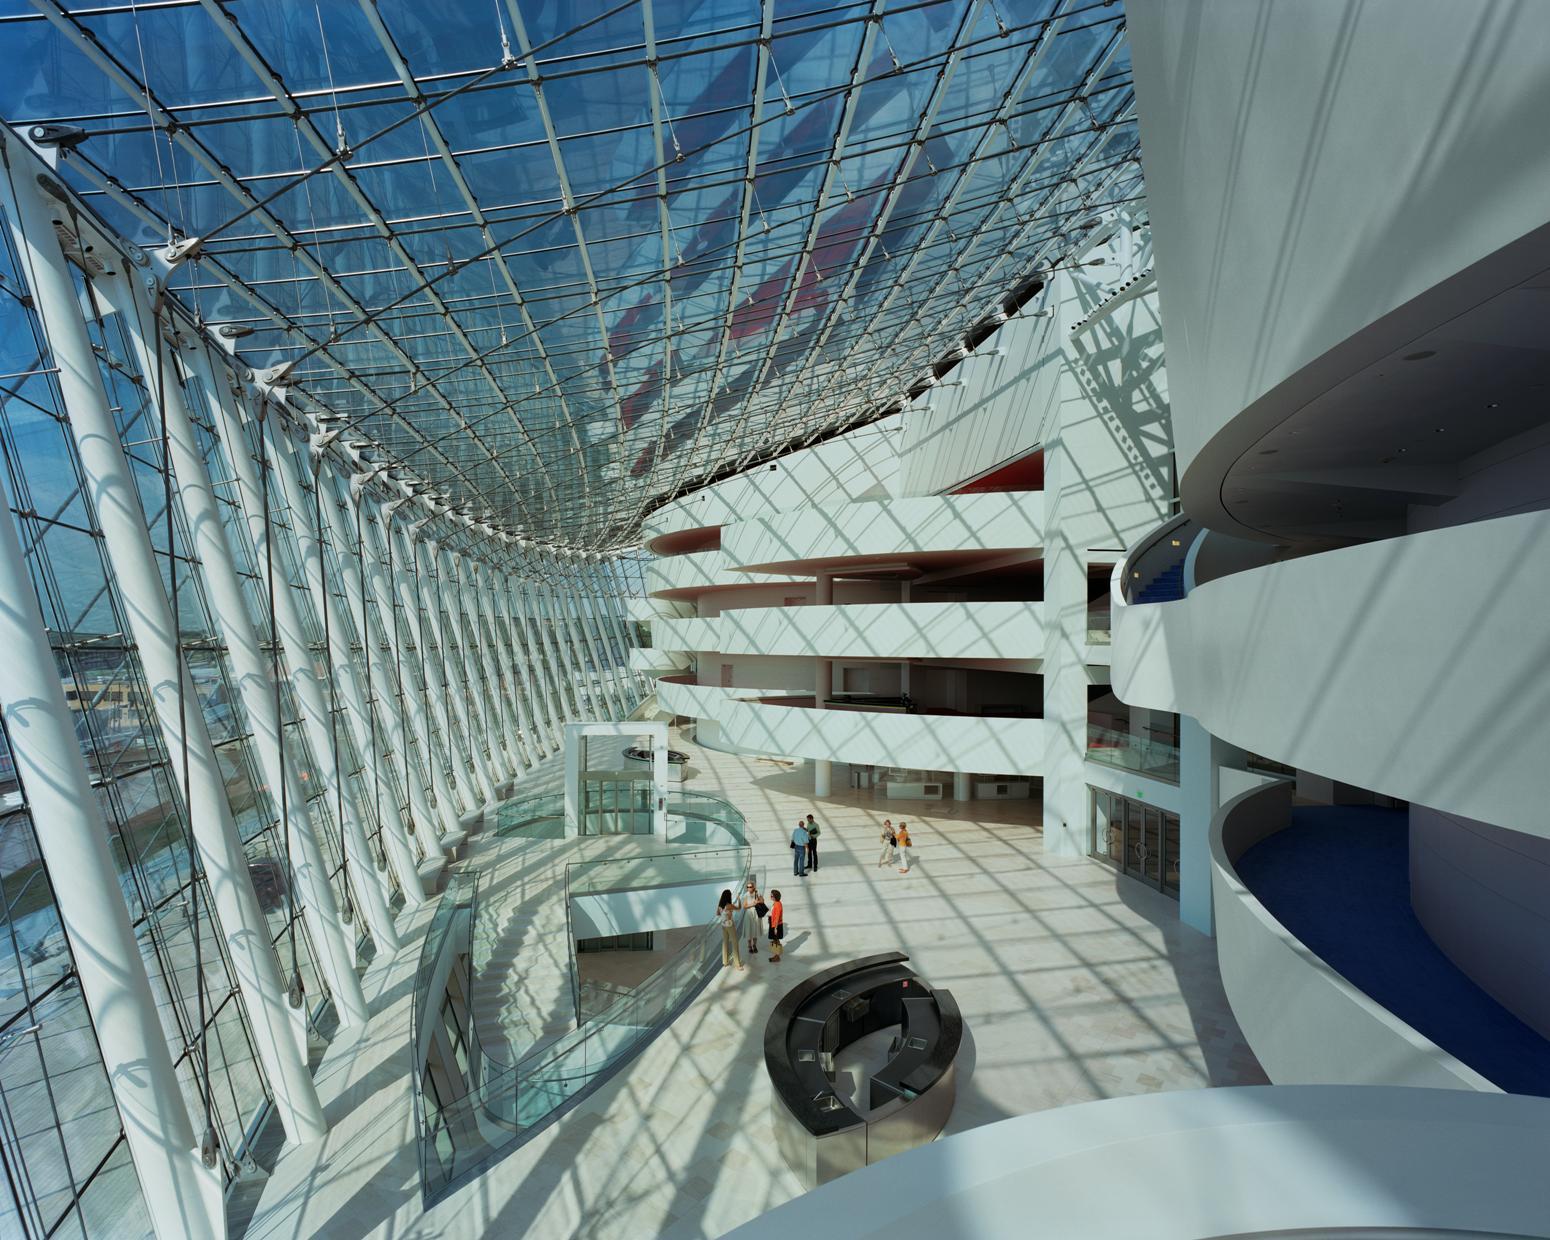 Brandmeyer-great-hall-photo-by-tim-hursley_Kaufmann Center for the Performing Arts